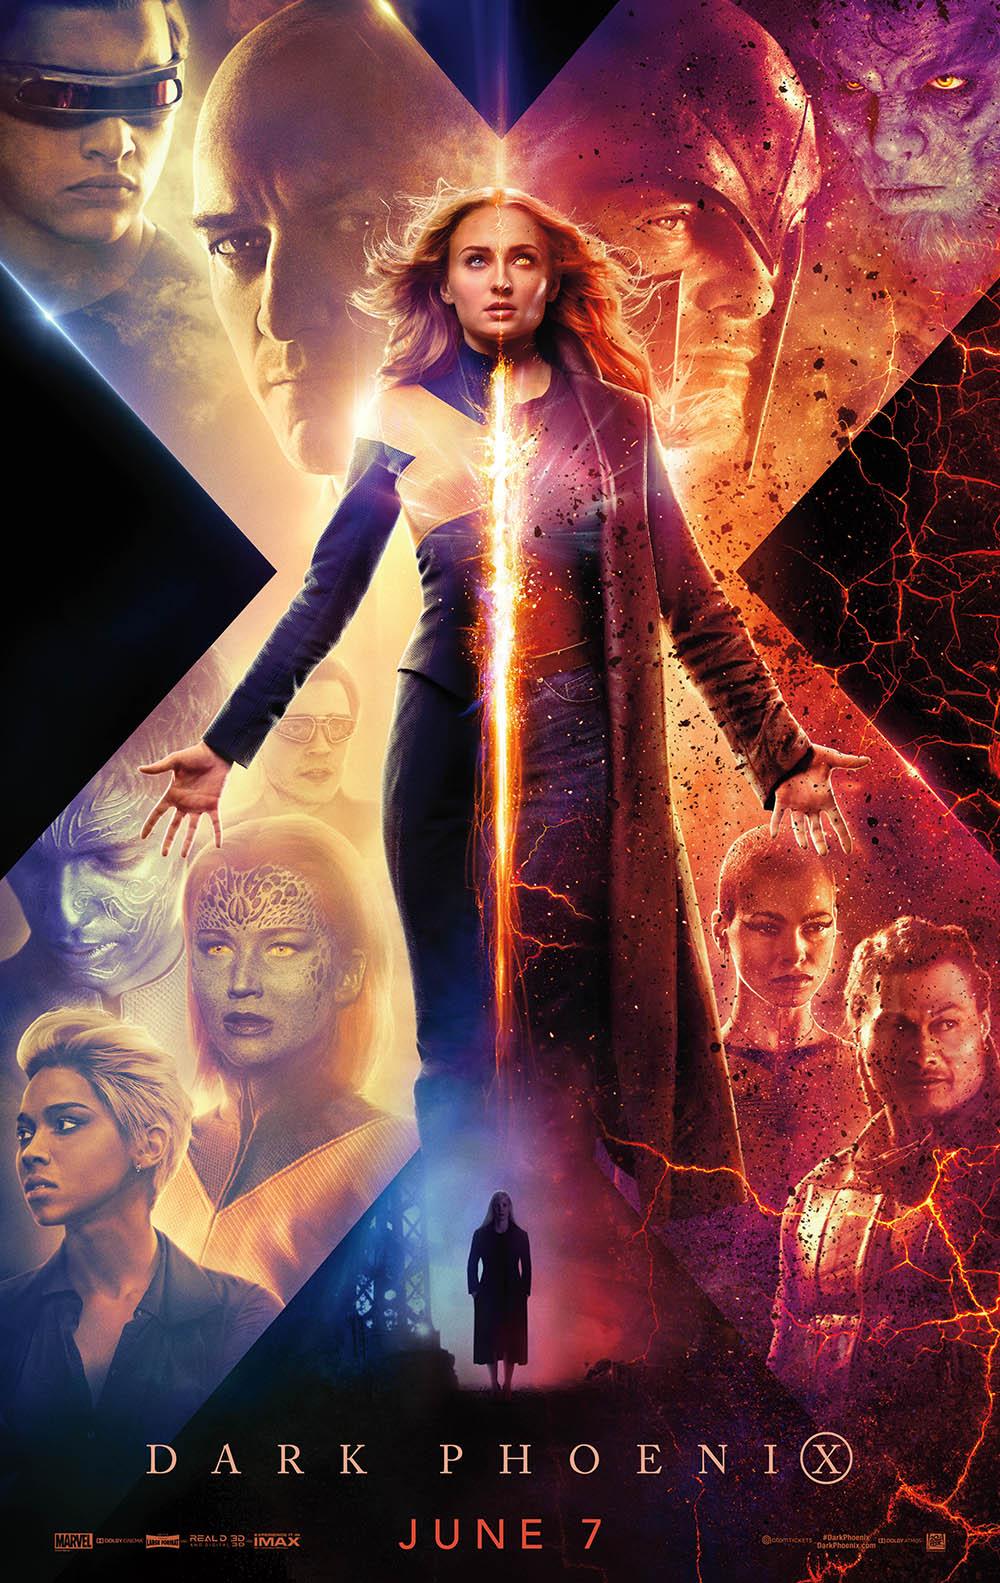 Dark-phoenix-3D-movie.jpeg